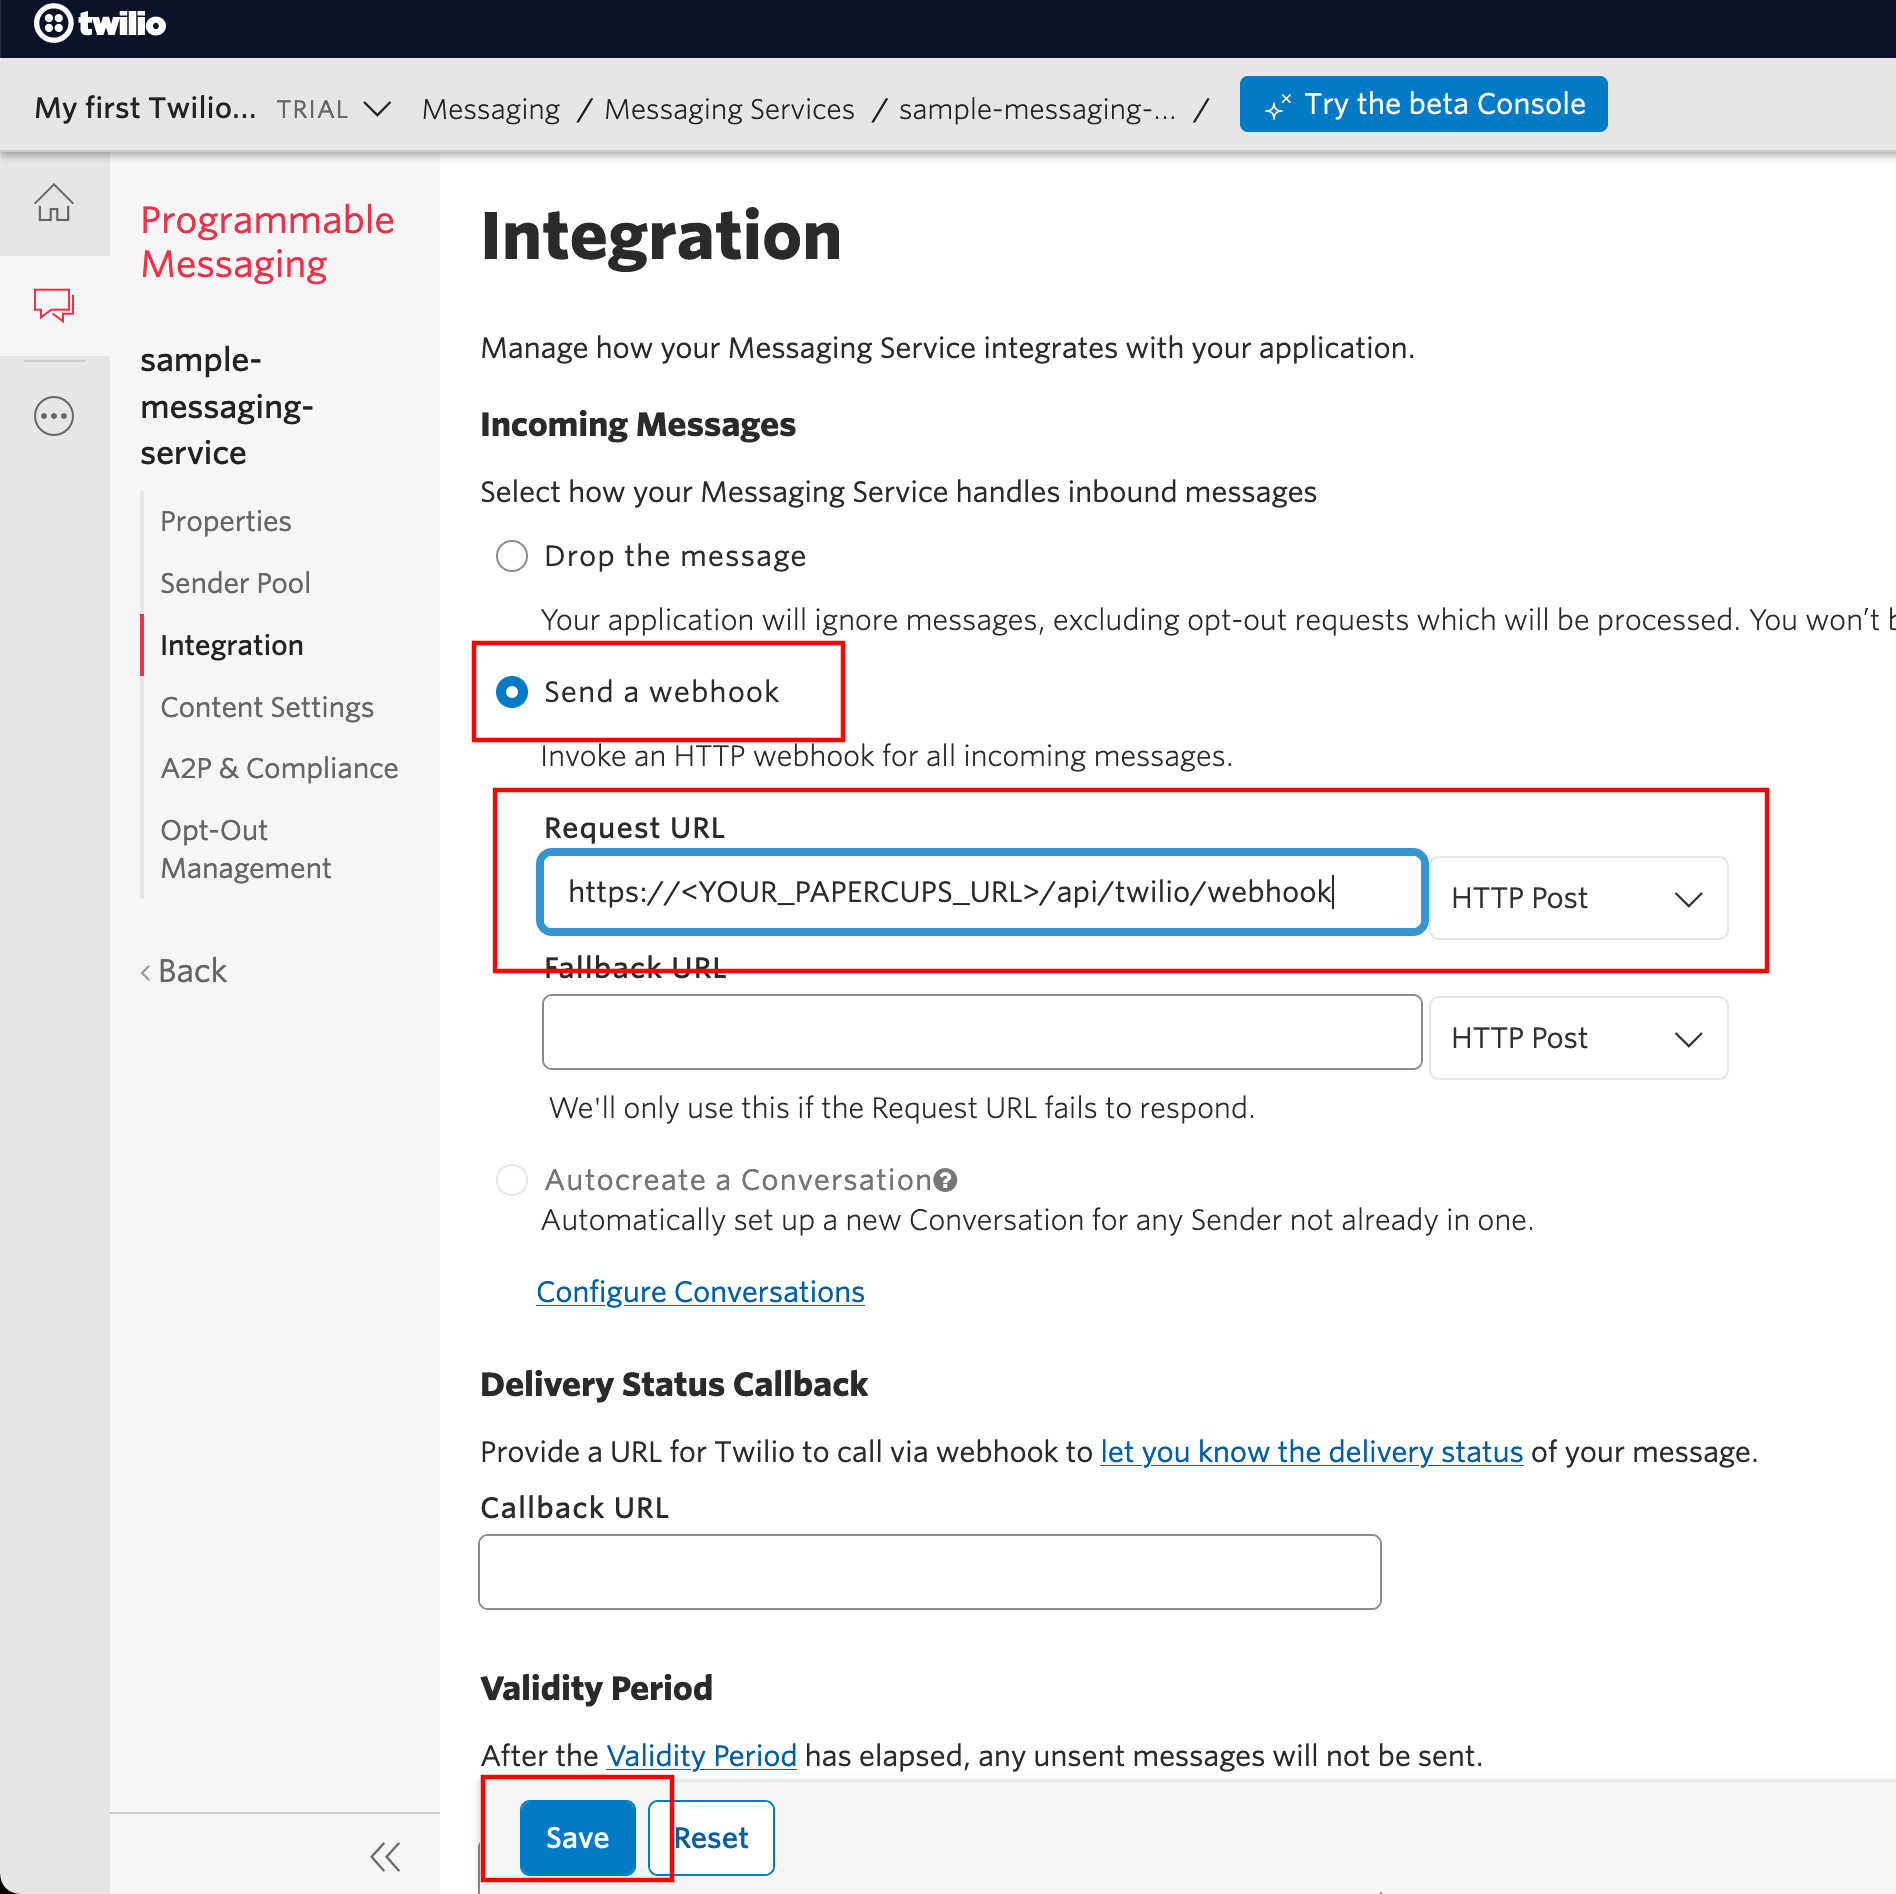 twilio-integrations-tab